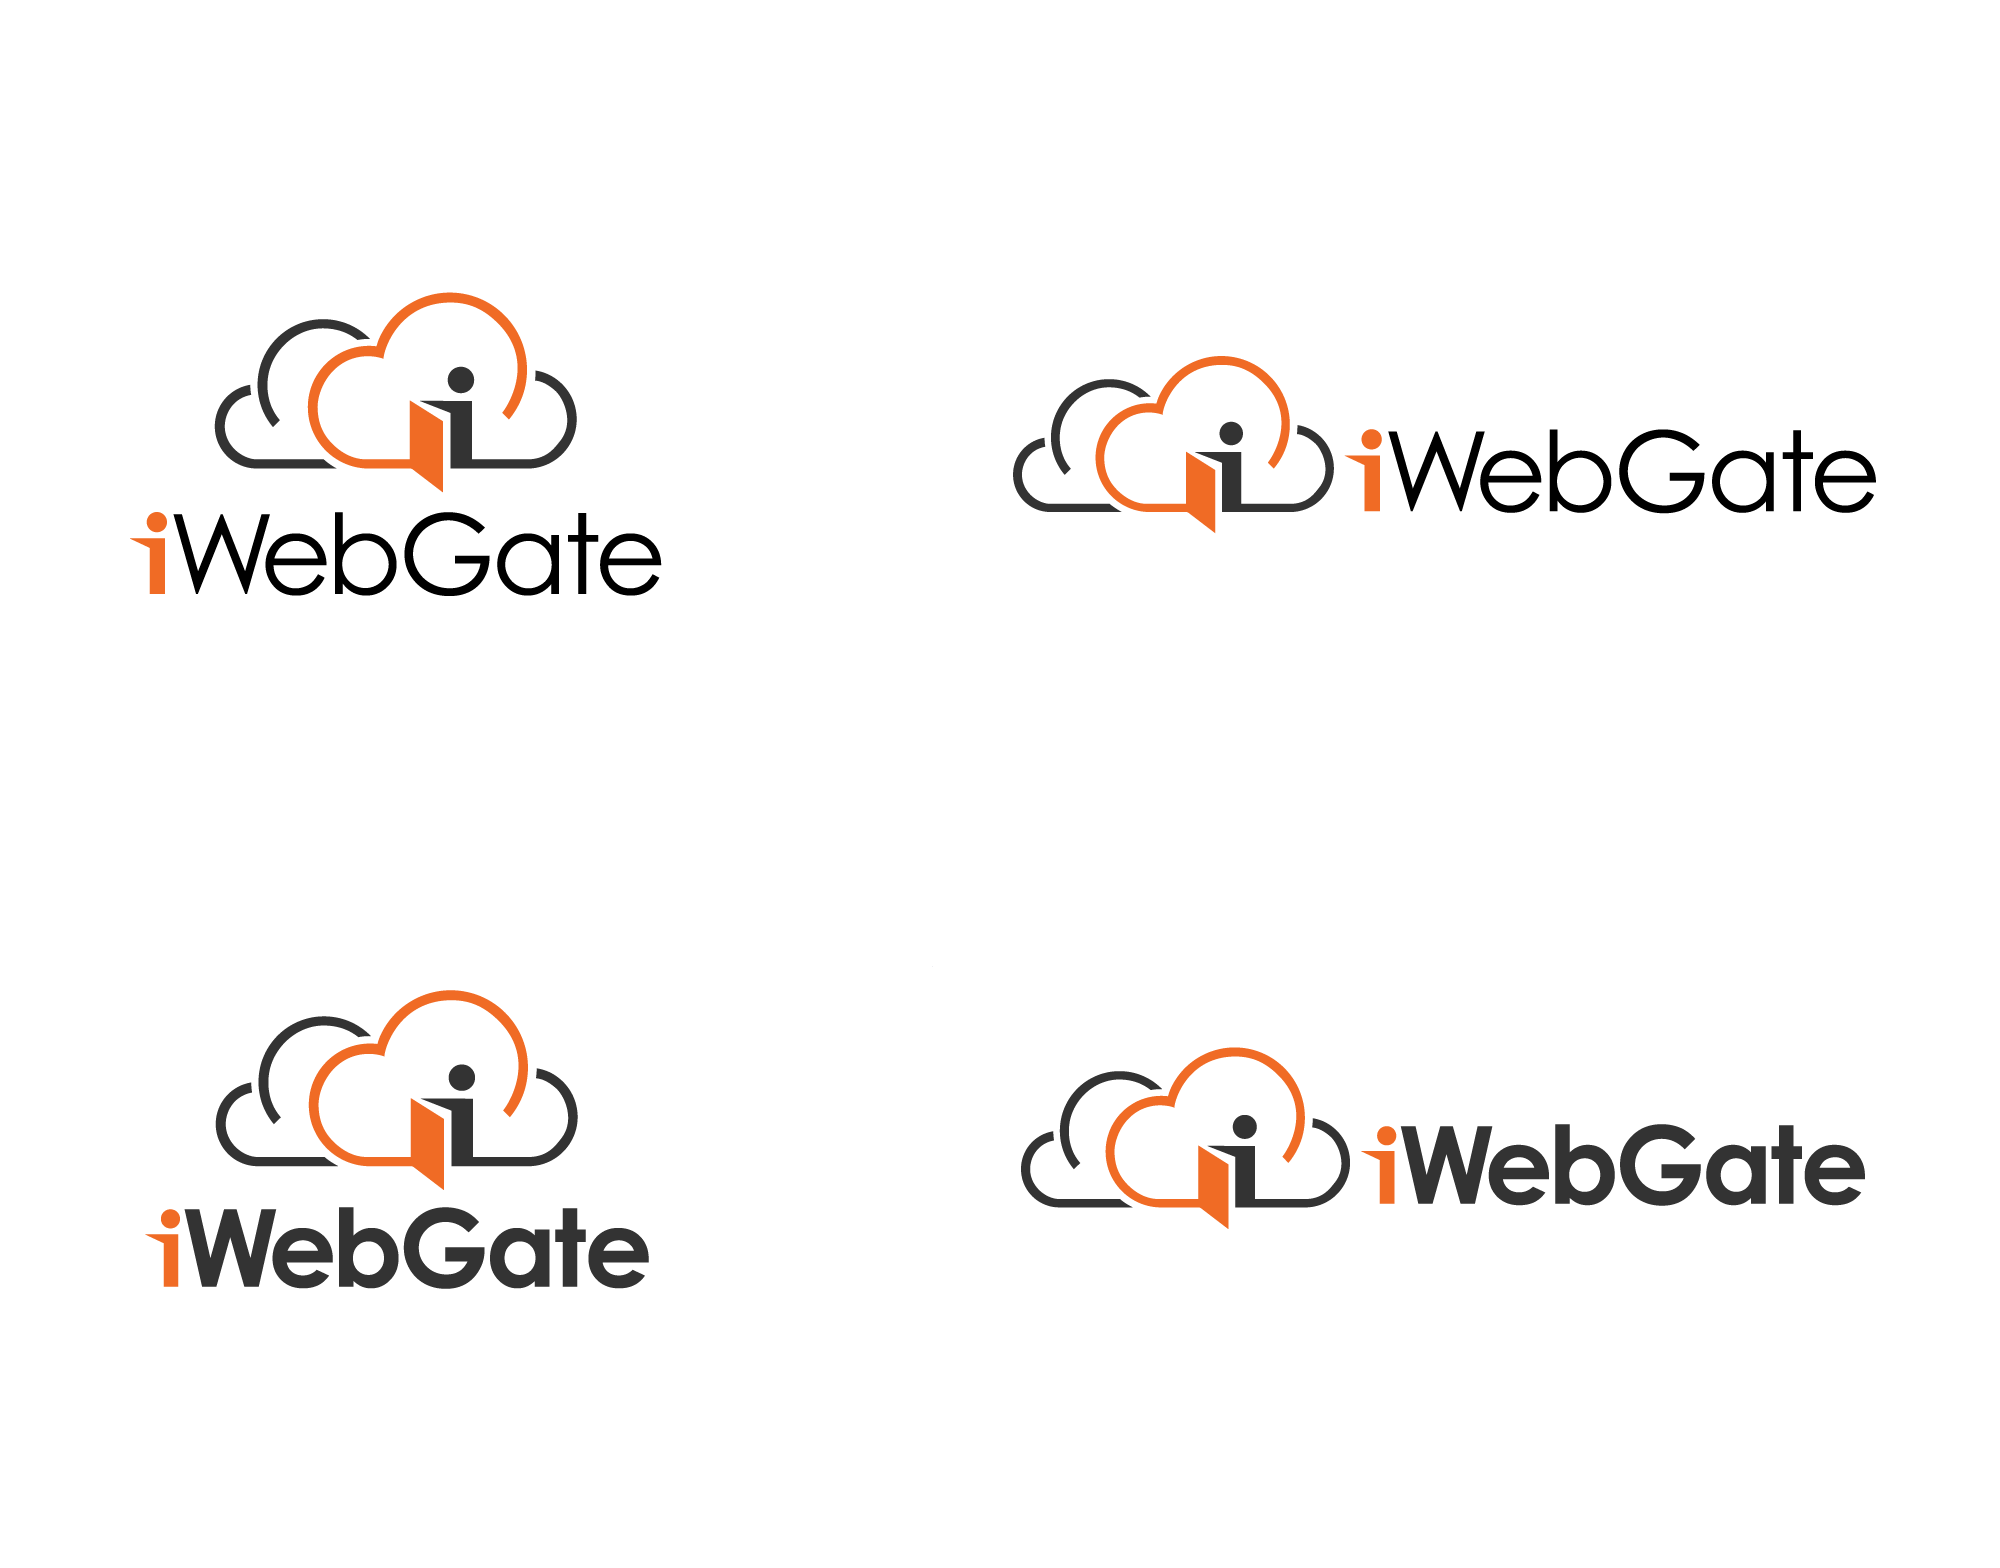 New logo wanted for iWebGate